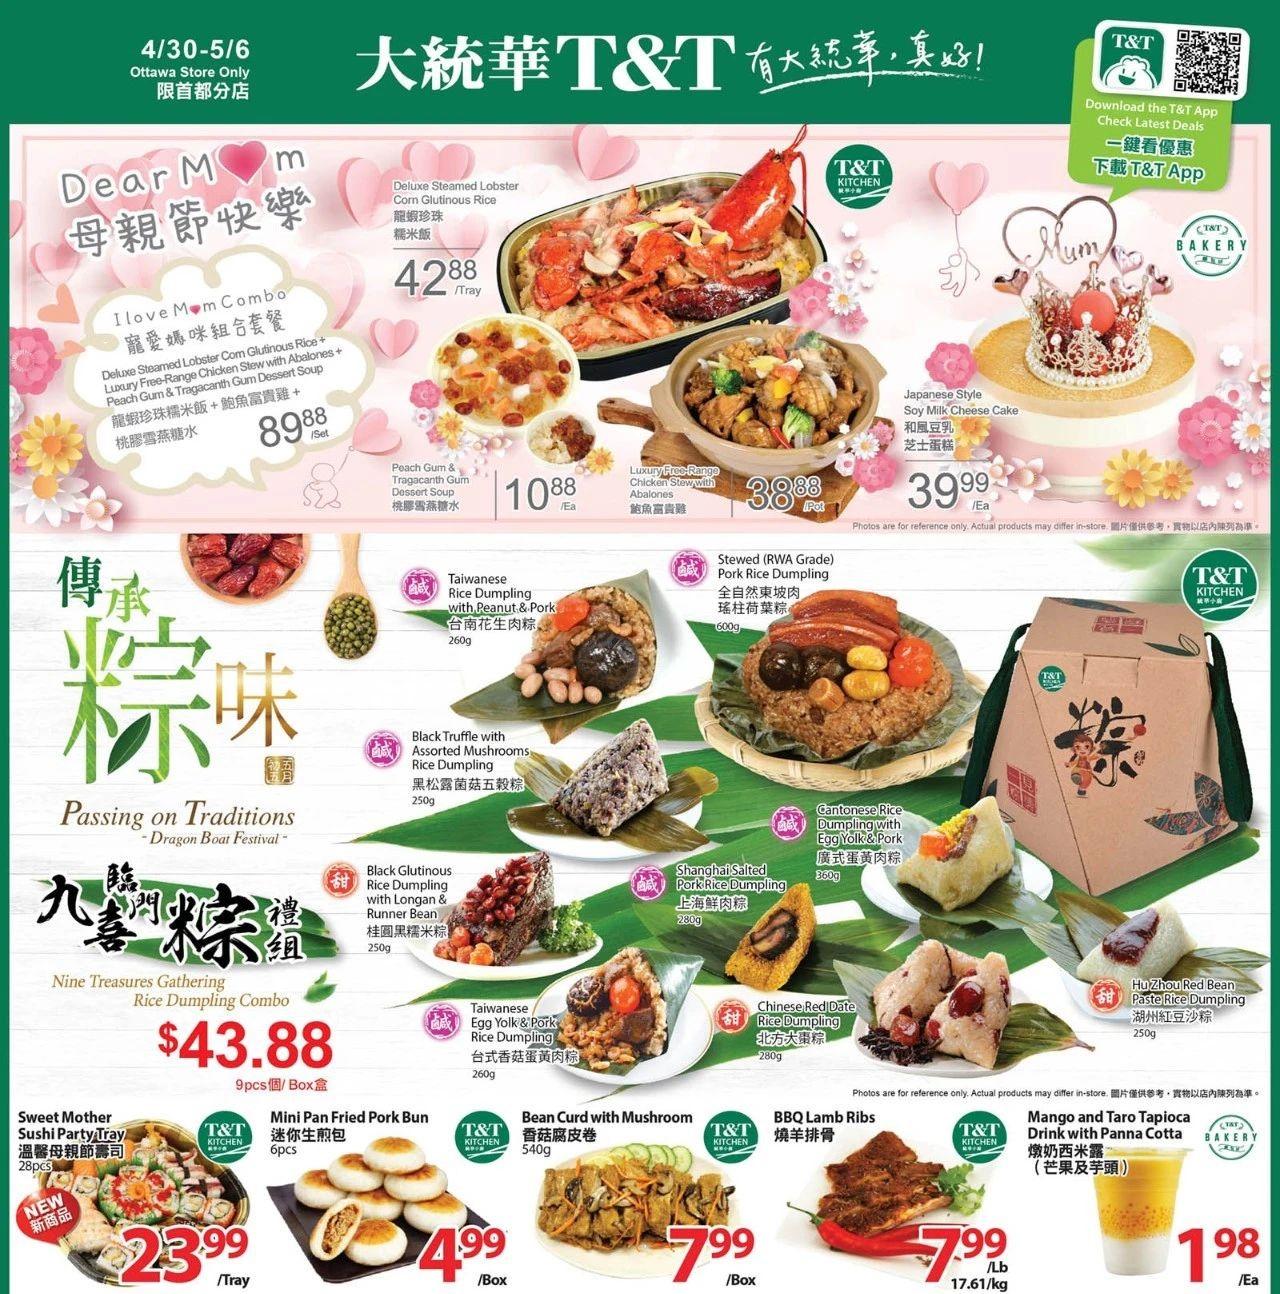 TNT Supermarket Ottawa  Flyer Apr 30